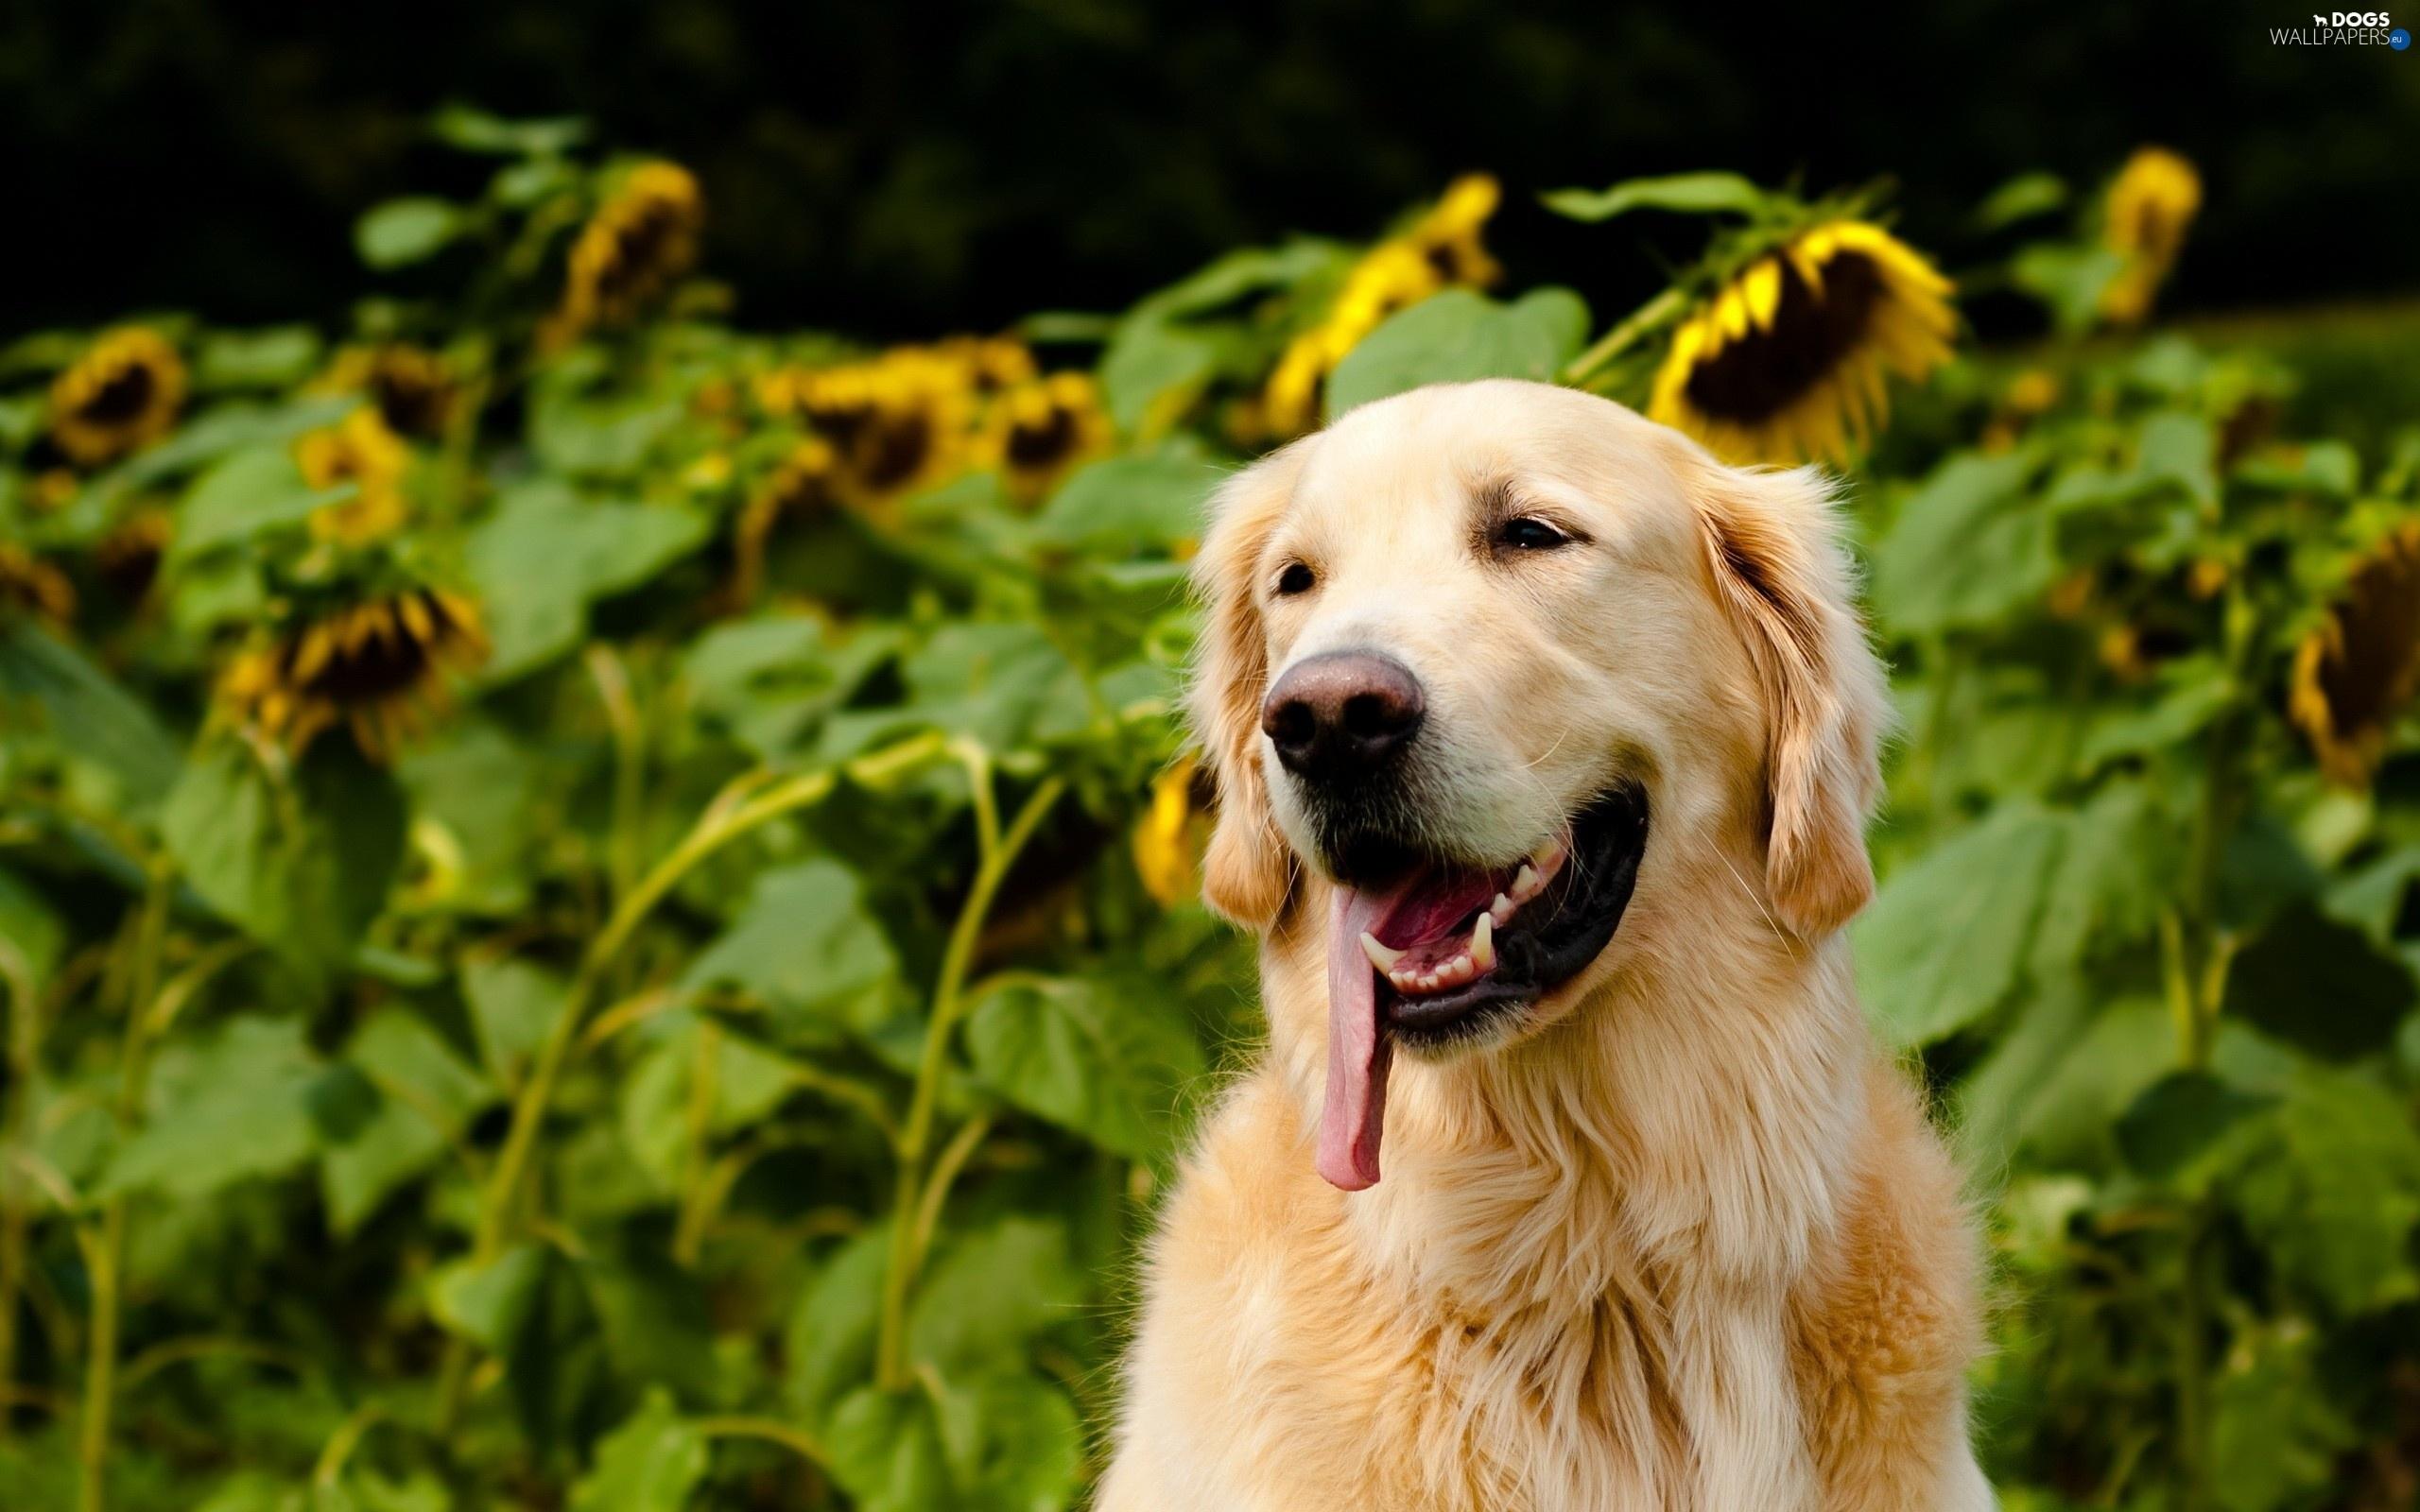 Windows 8 1 Wallpaper Hd Free Download Tongue Nice Sunflowers Golden Retriever Dogs